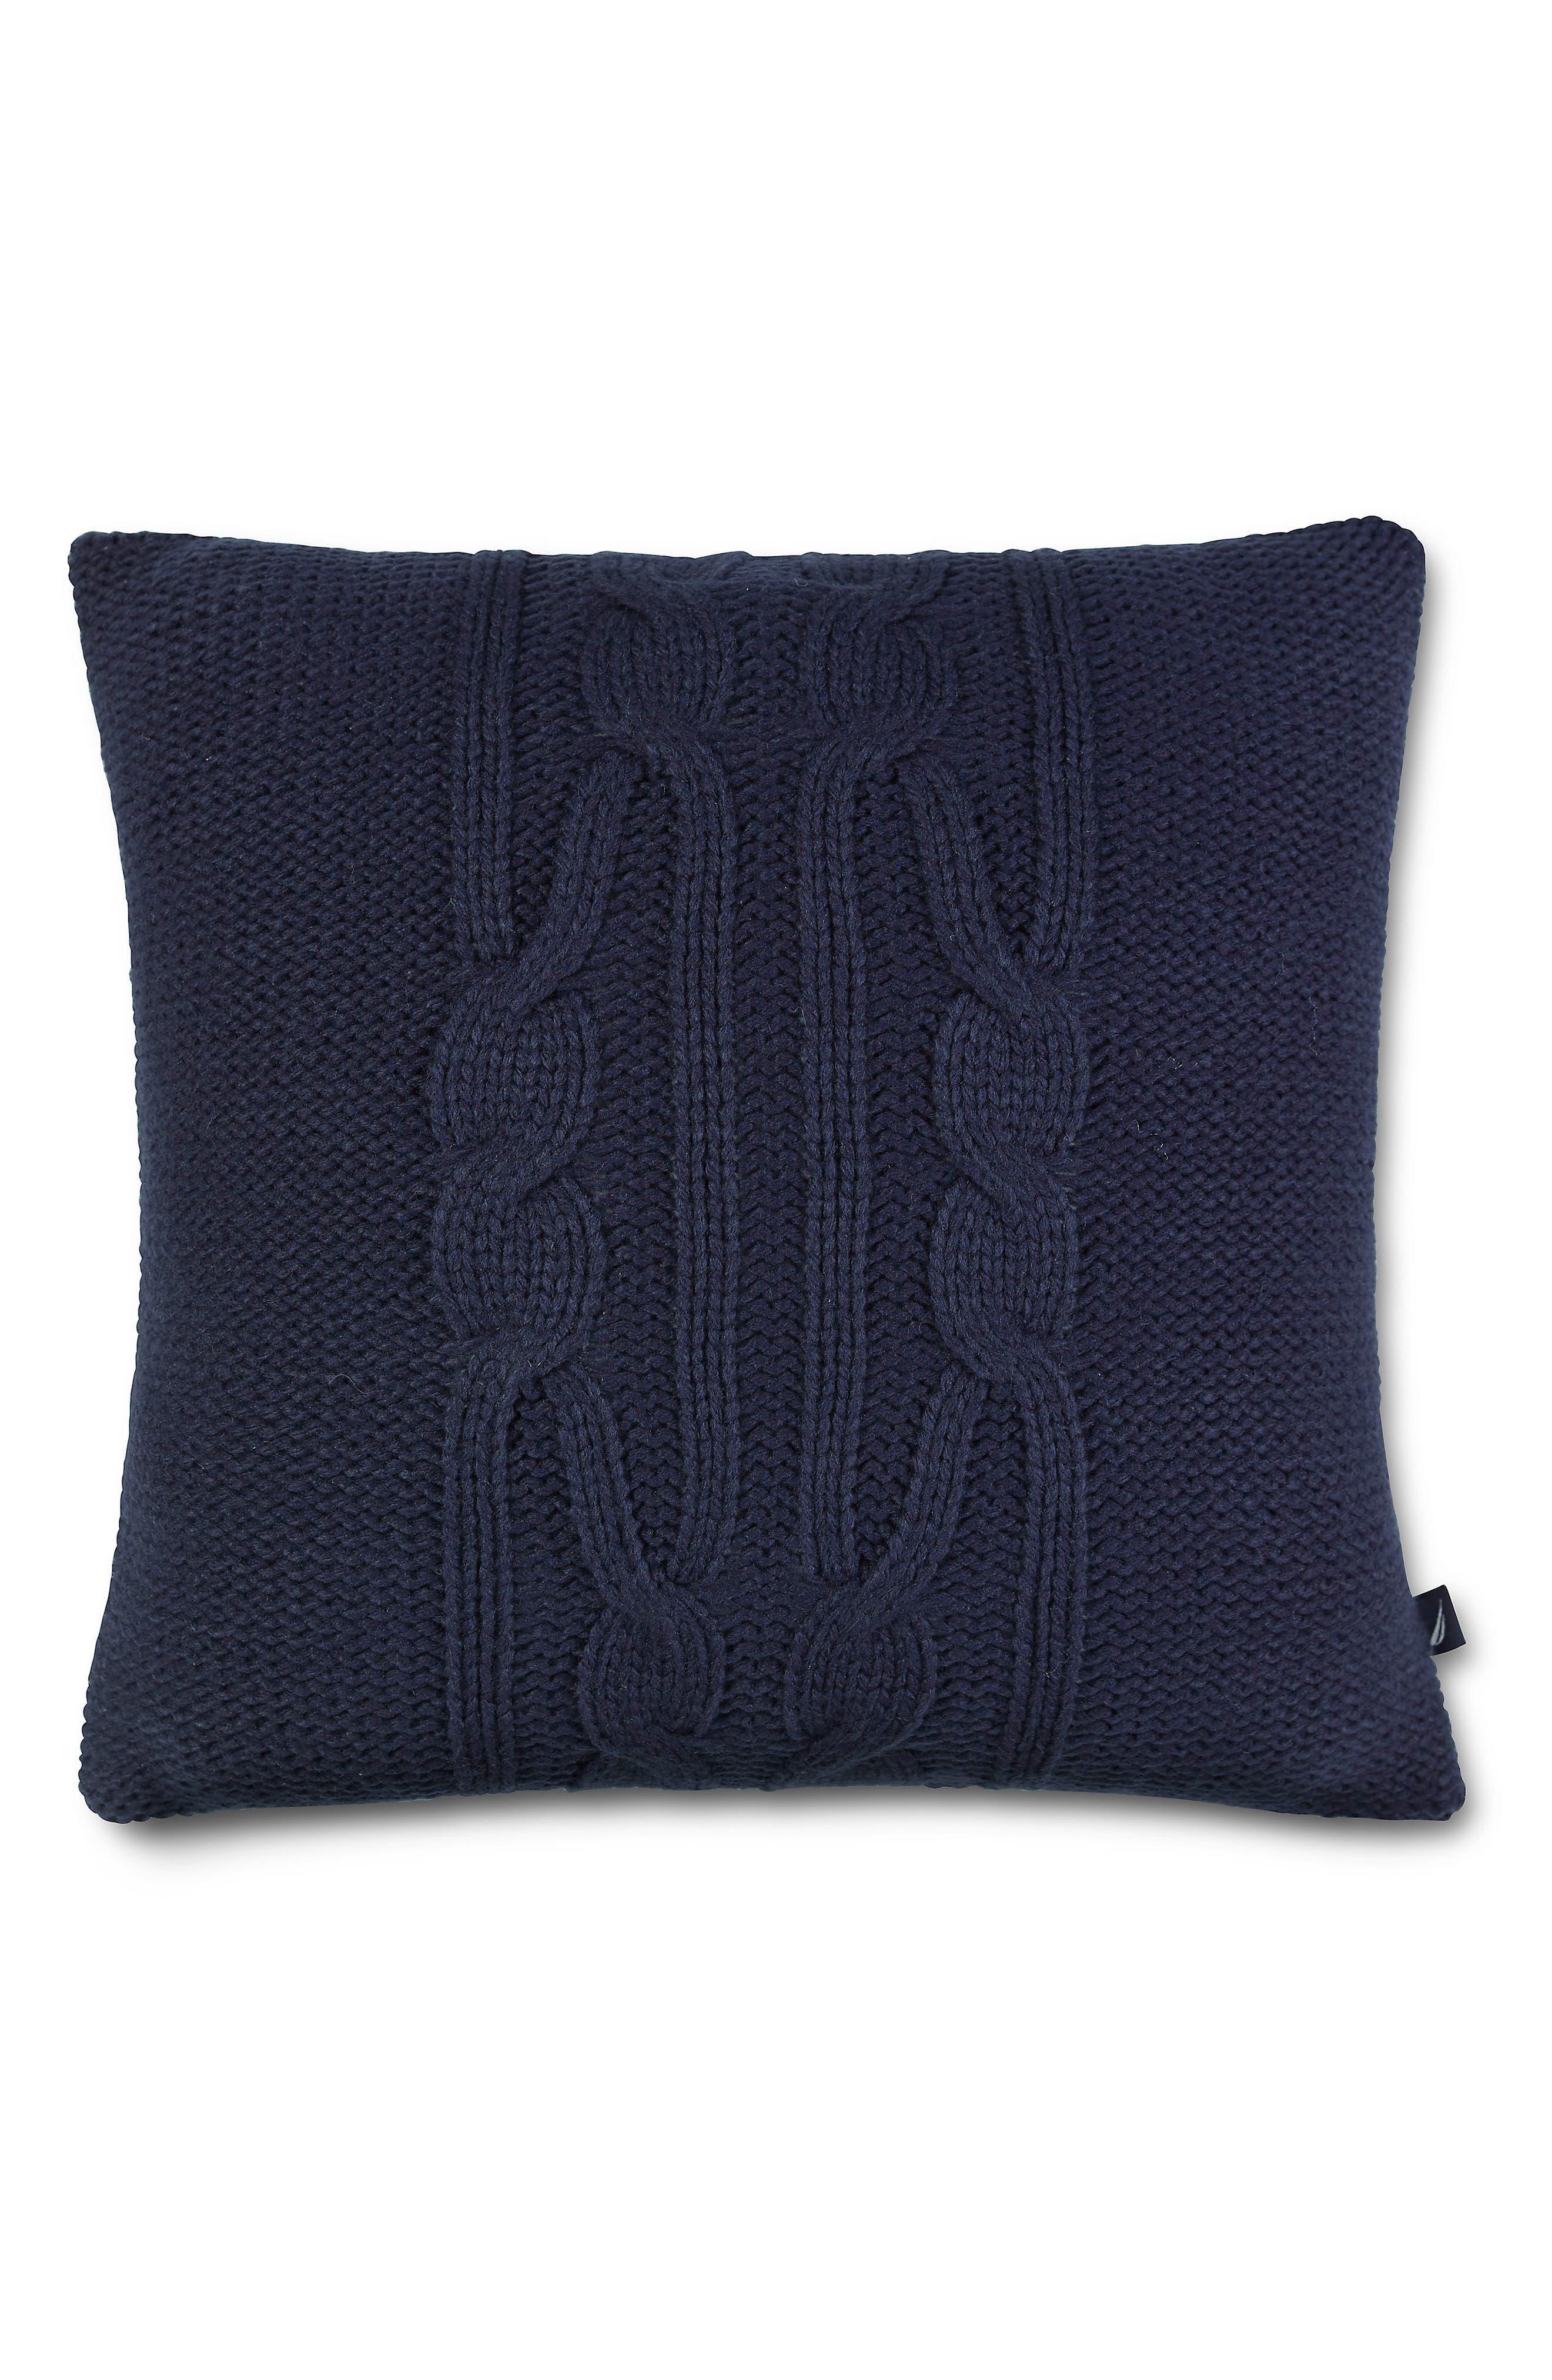 Bartlett Knit Pillow,                             Main thumbnail 1, color,                             Navy